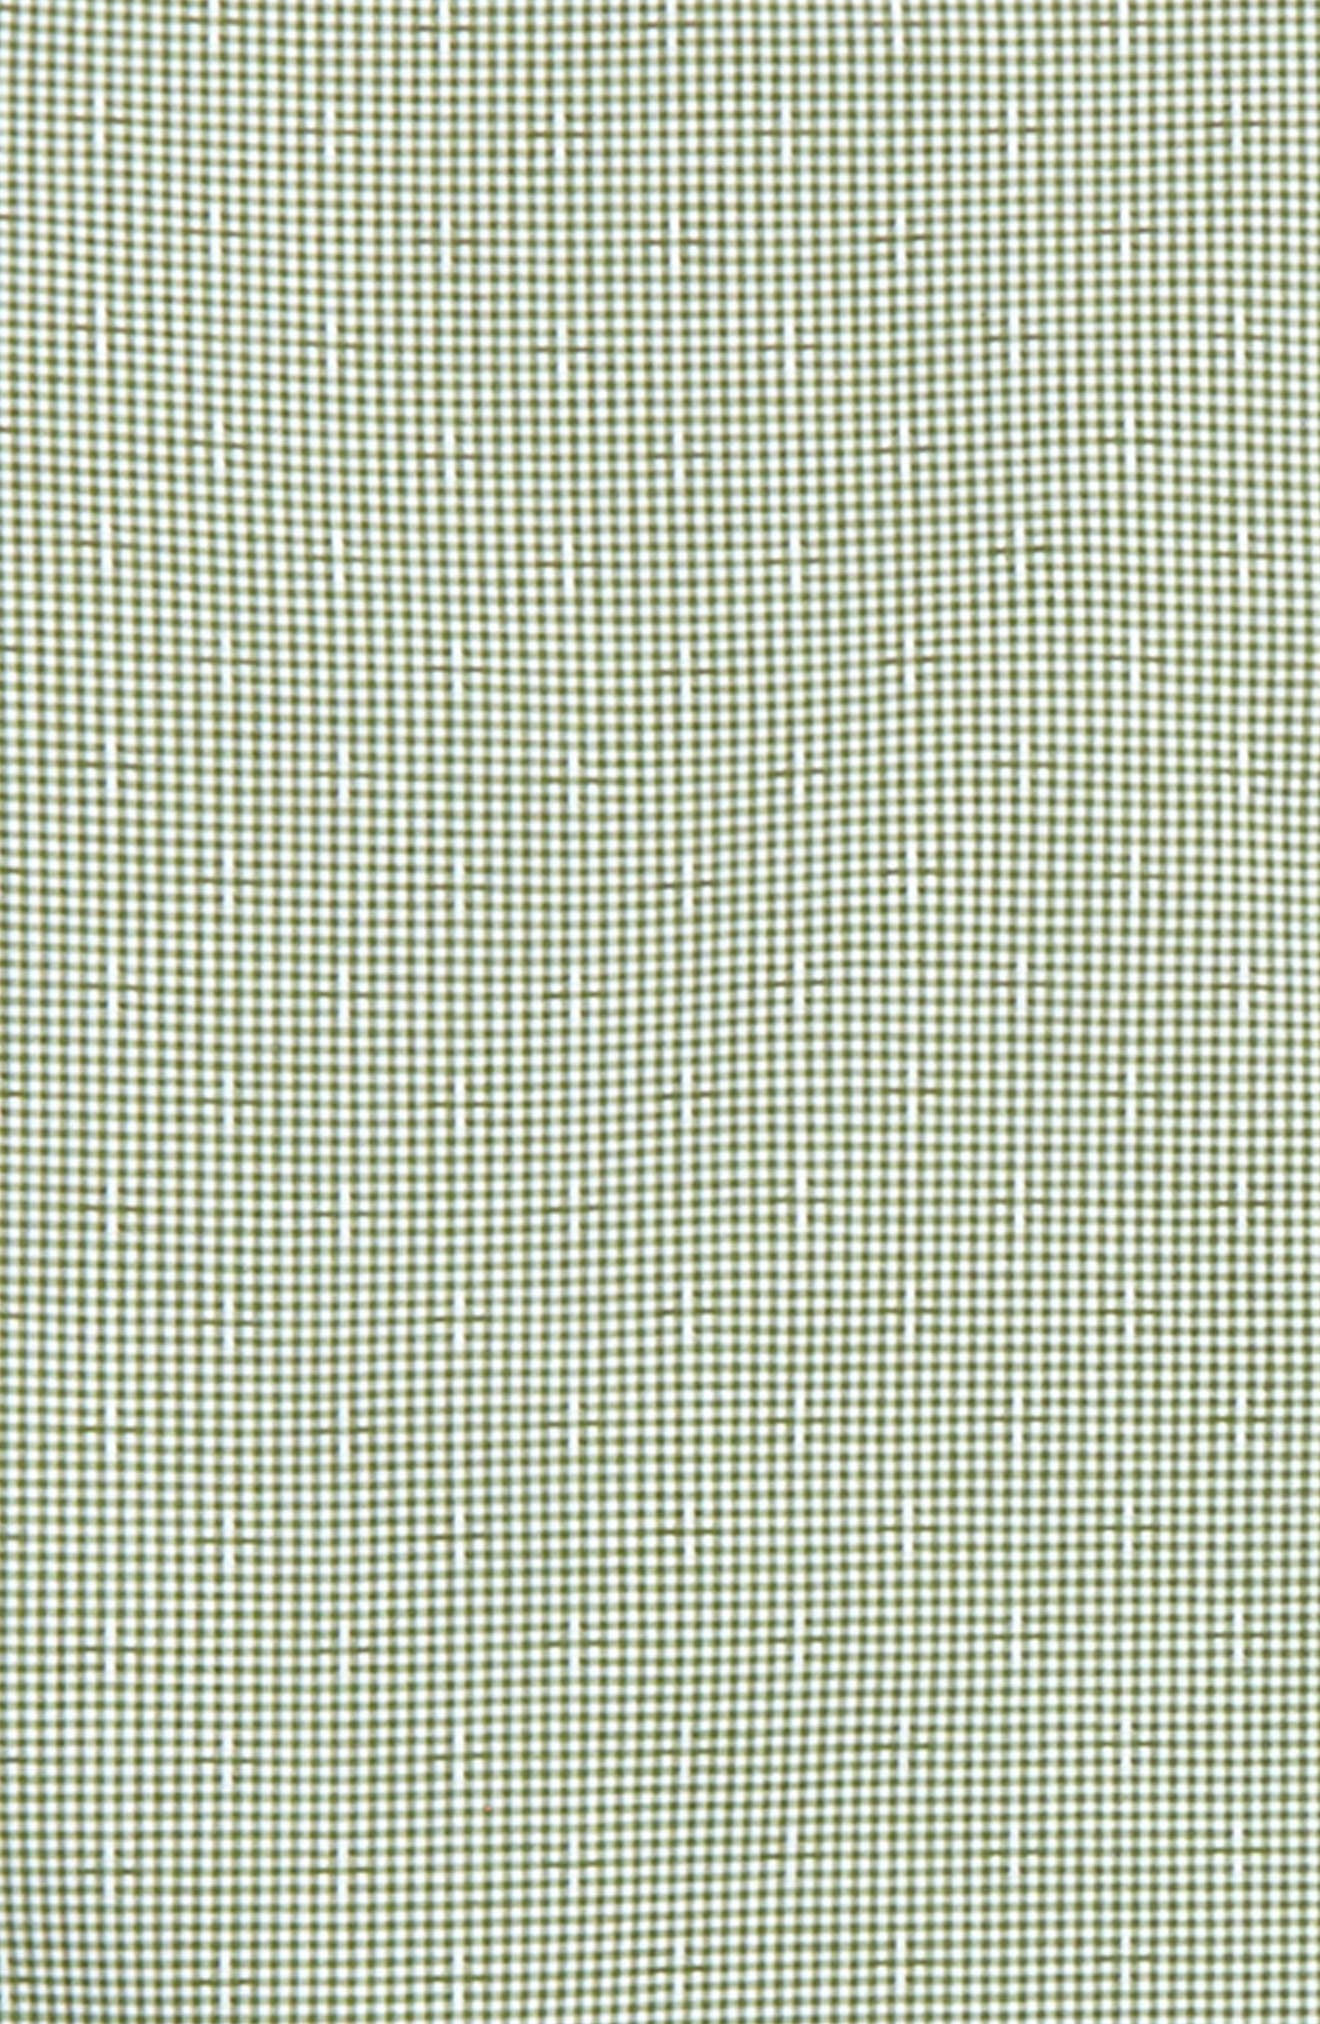 Microcheck Dress Shirt,                             Alternate thumbnail 2, color,                             300